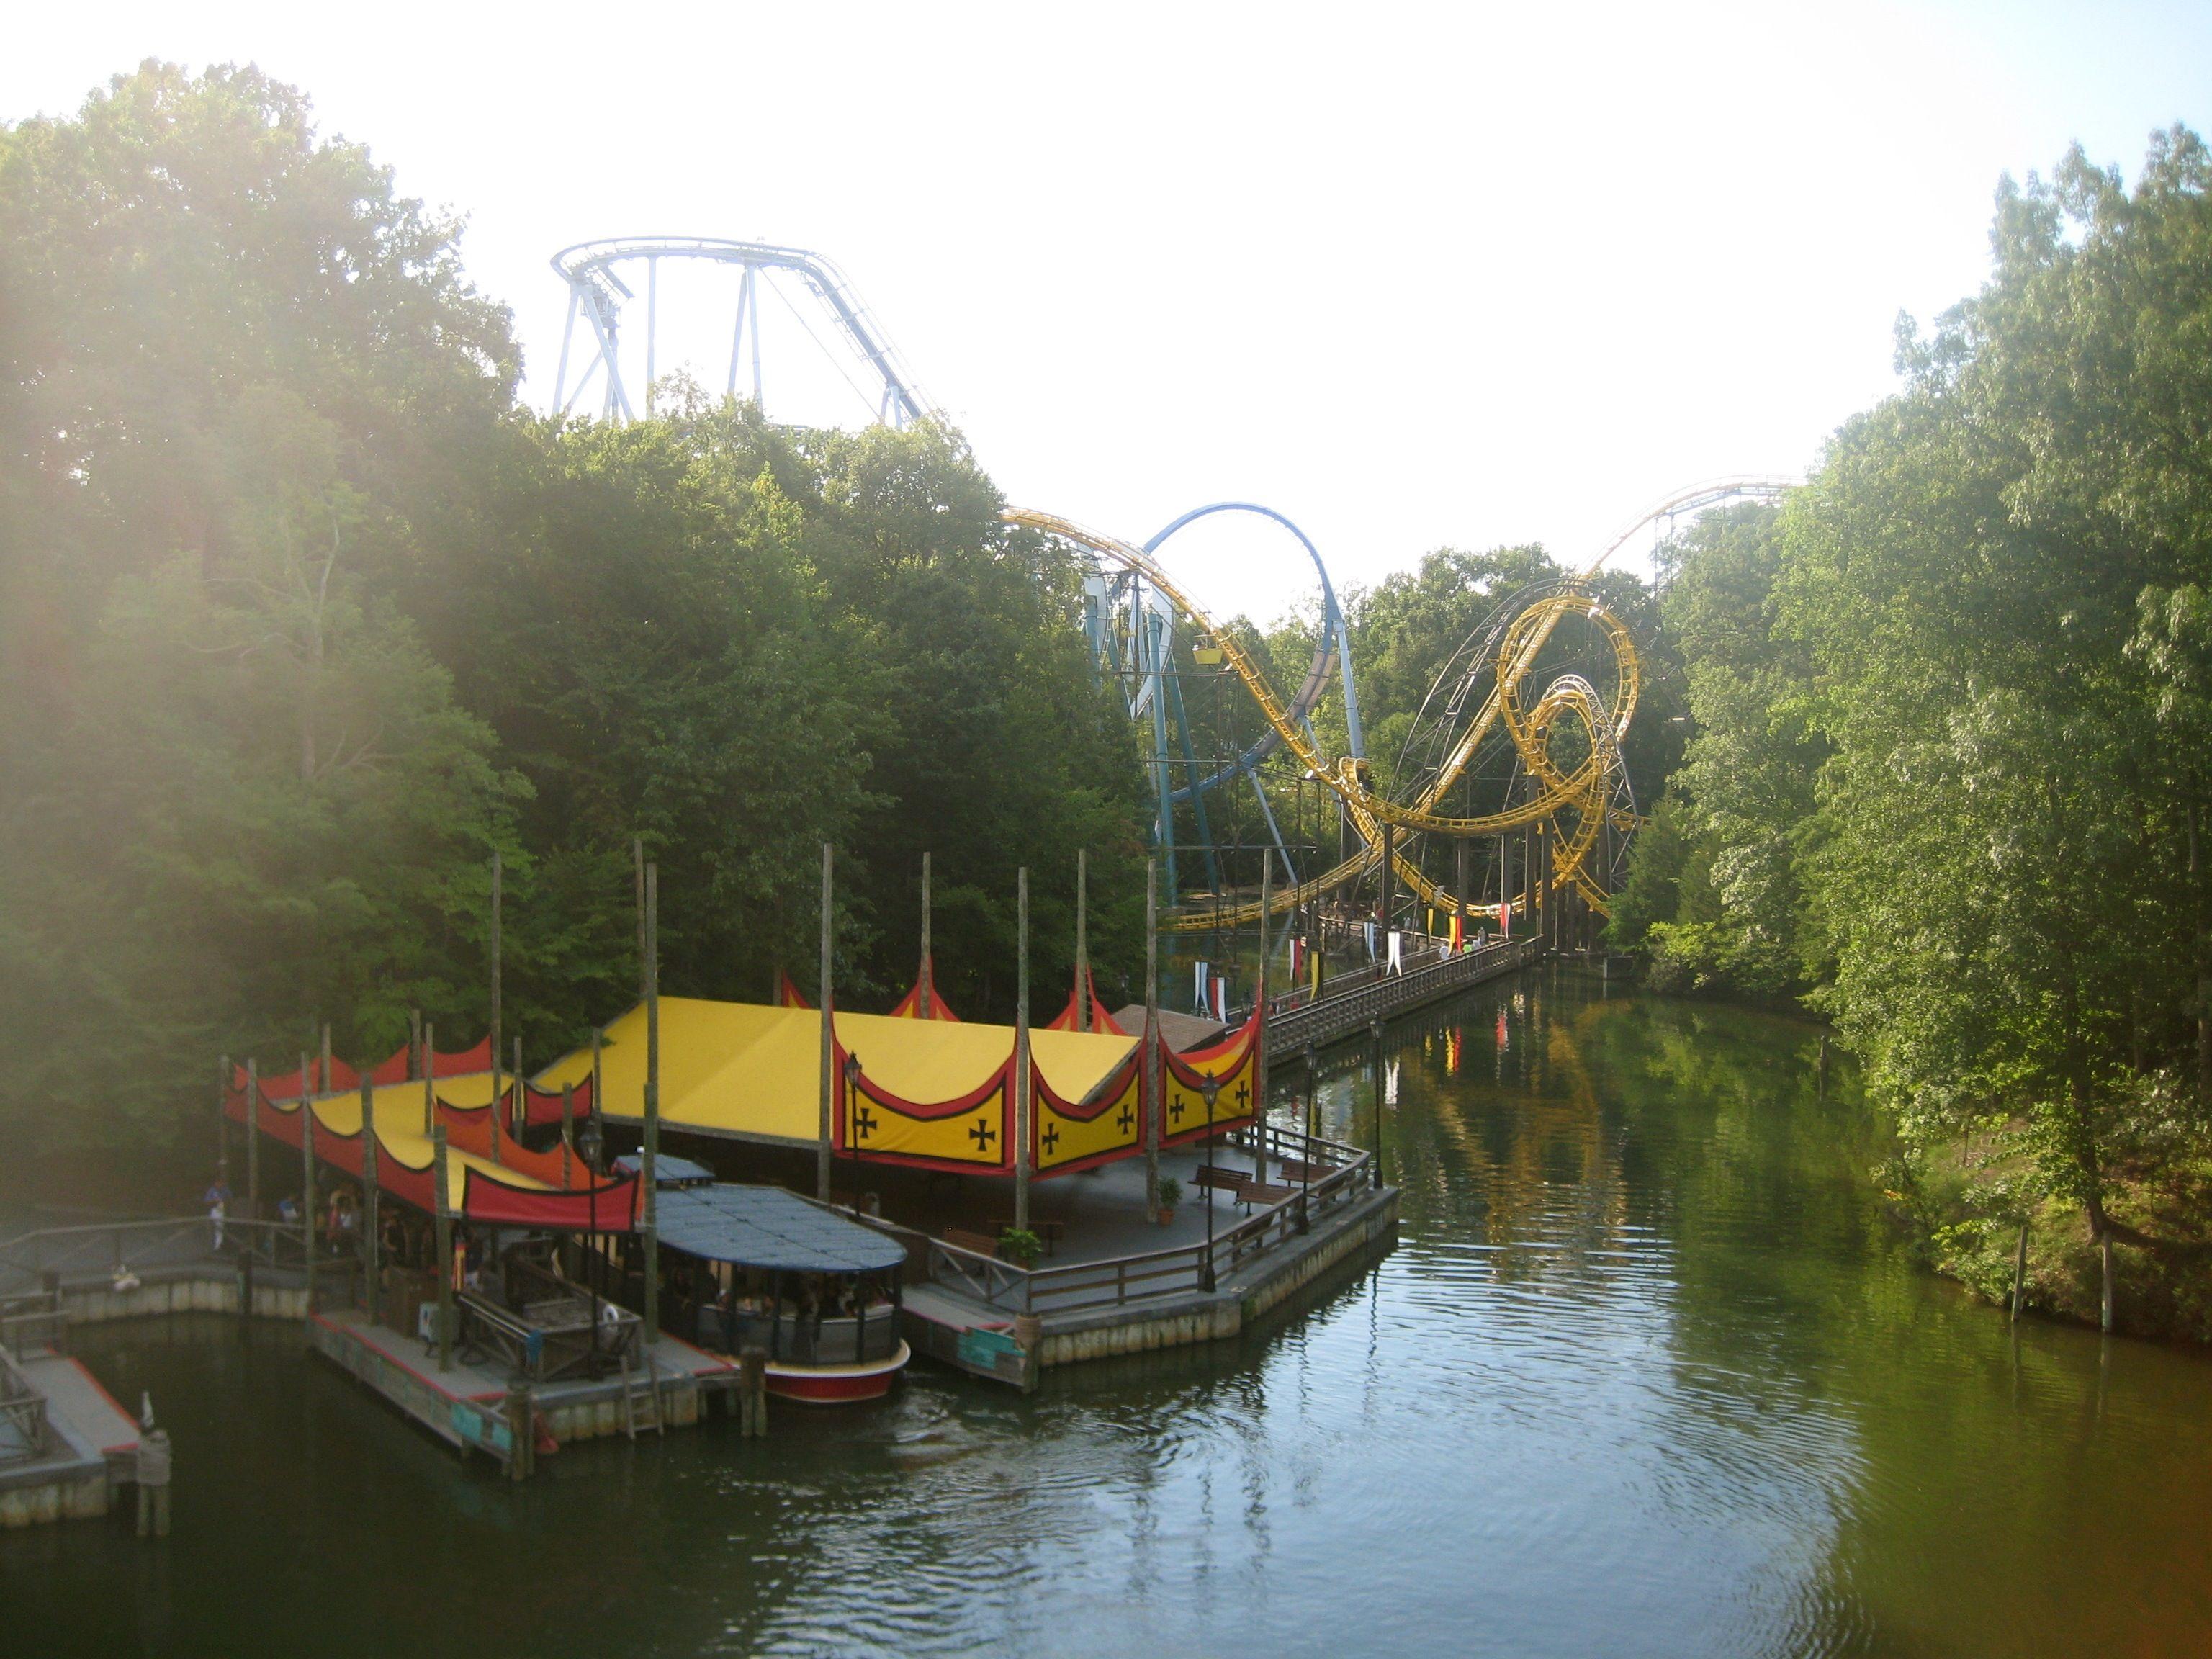 11777fd1810ab3d22d06040352e7d260 - How Far Is Busch Gardens Williamsburg From Dc